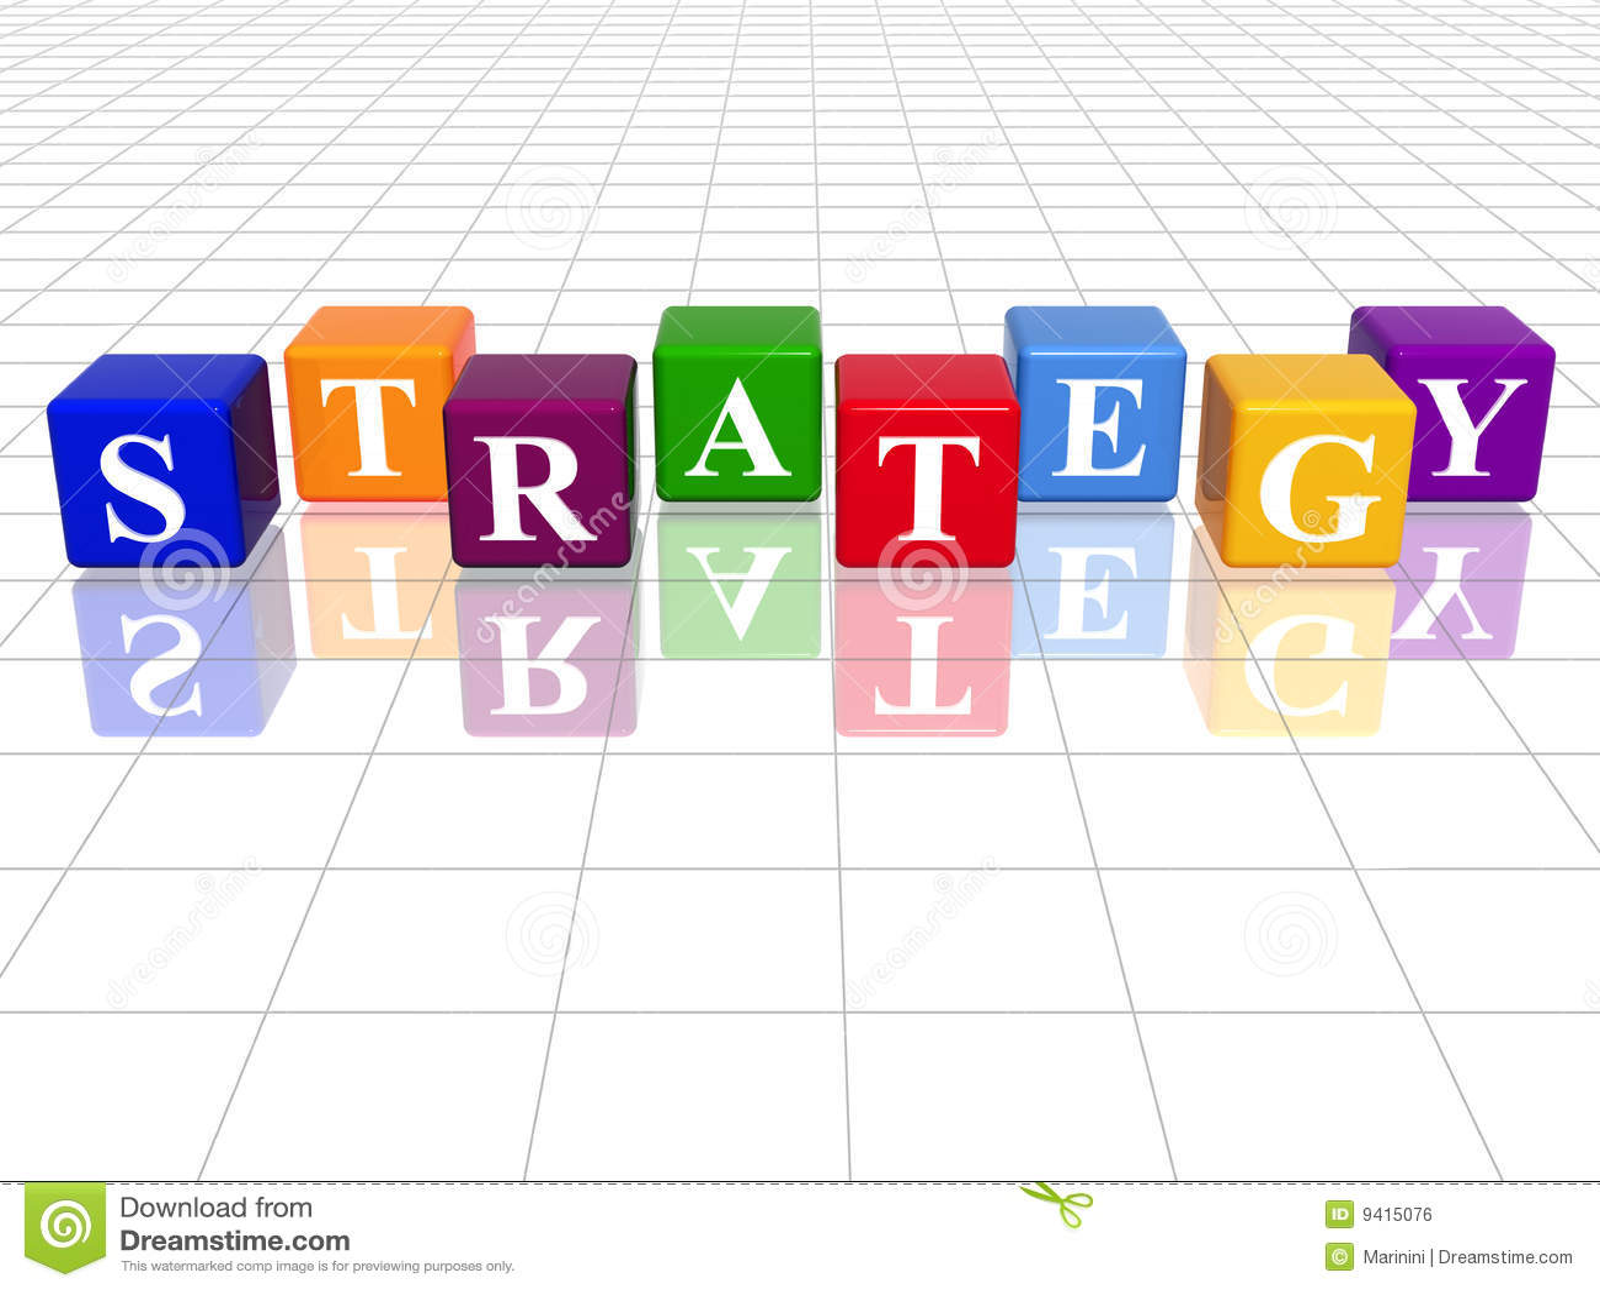 Colour strategia